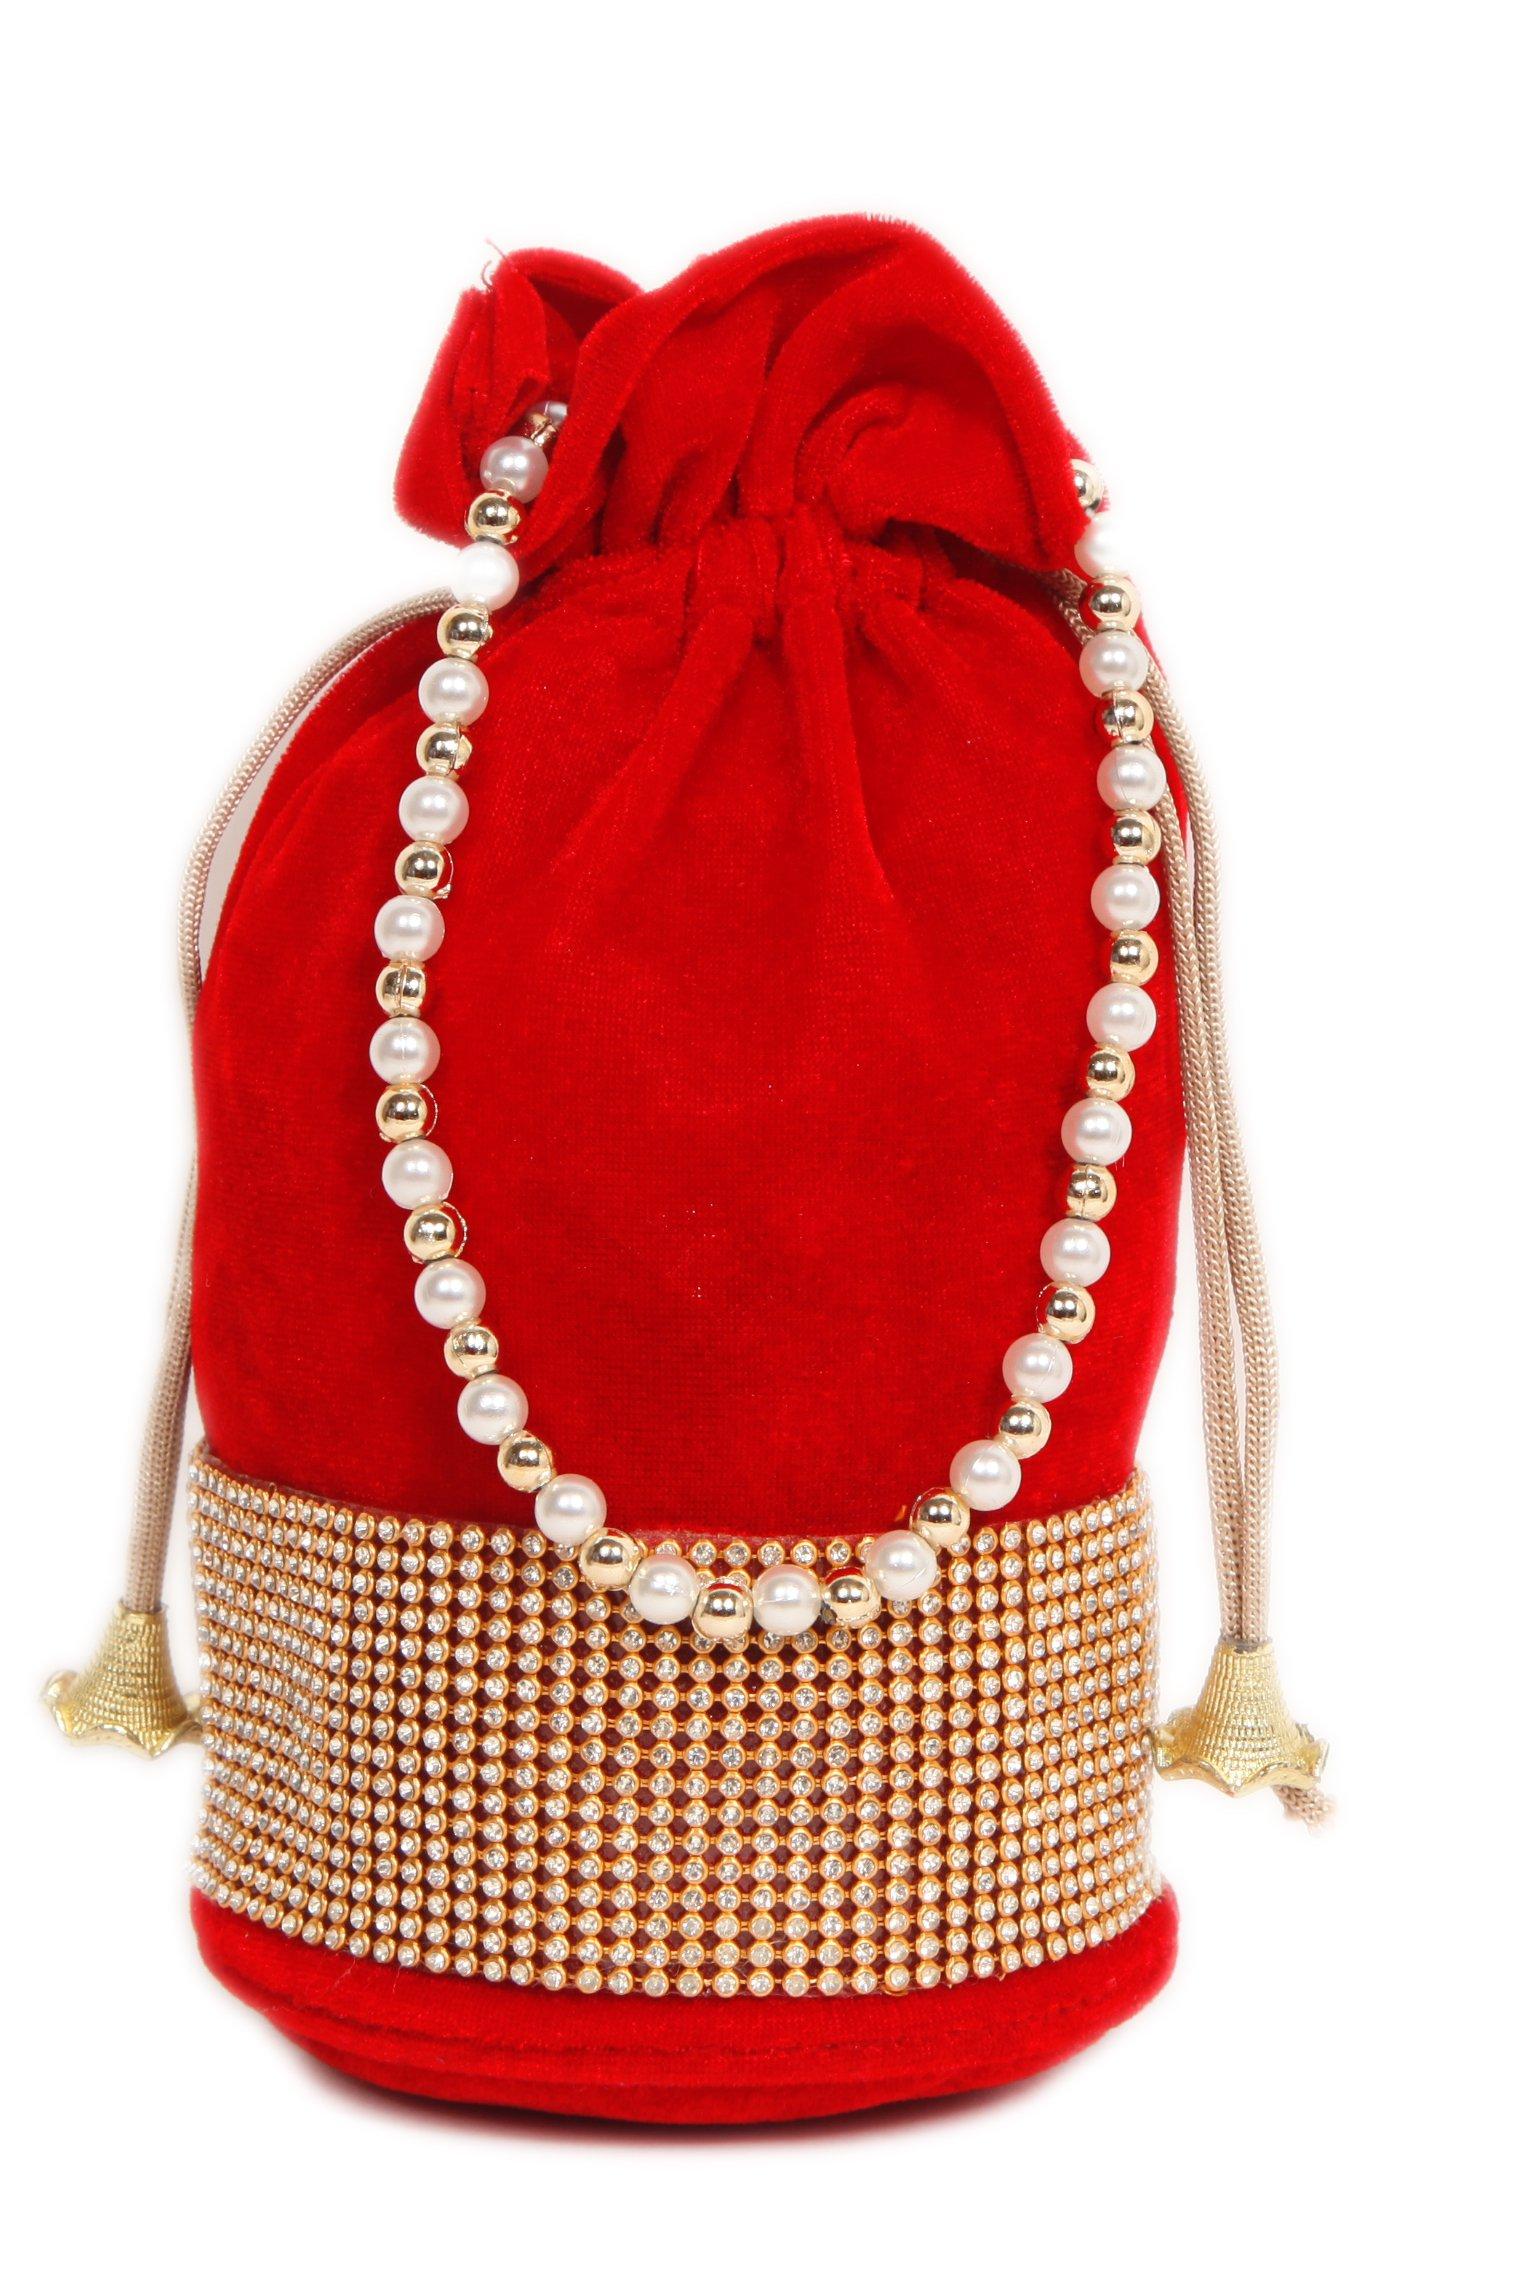 Indian Ethnic Handbag Stylish Red Velvet Potli Bag With Designer Pearls